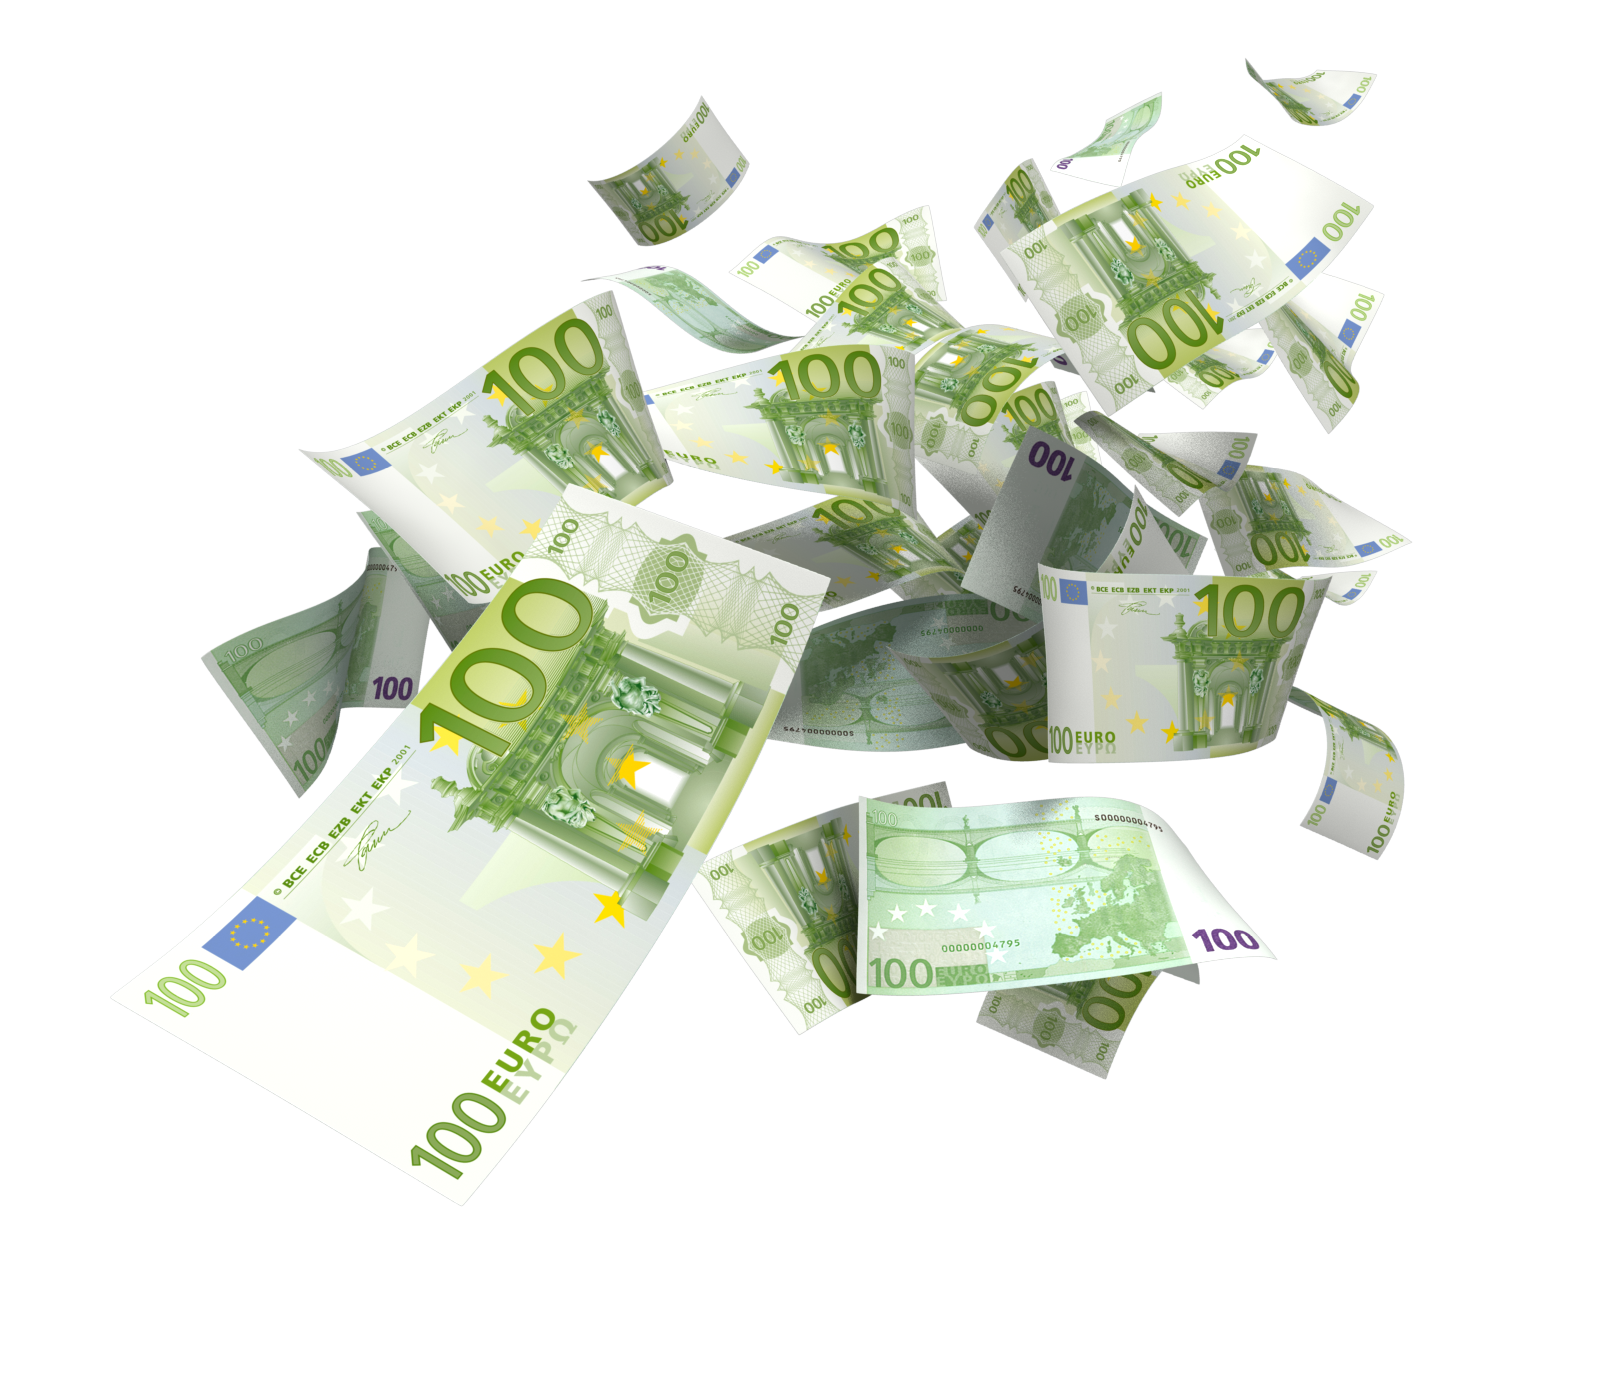 euro_money_falling_1600_clr_5174